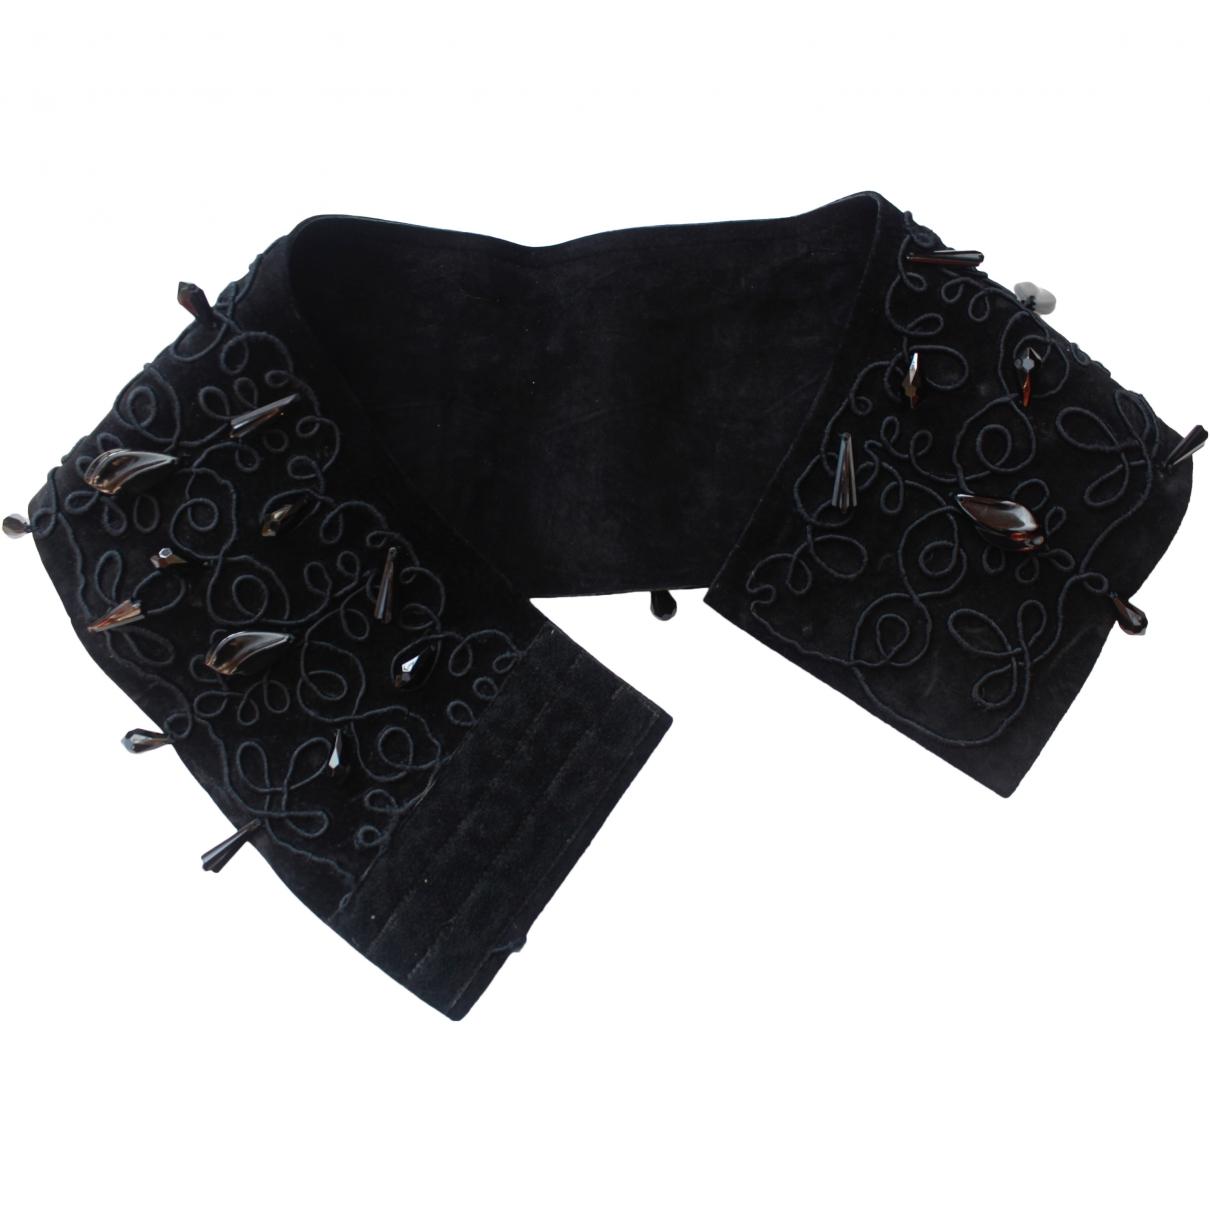 Dior \N Black Leather belt for Women 70 cm